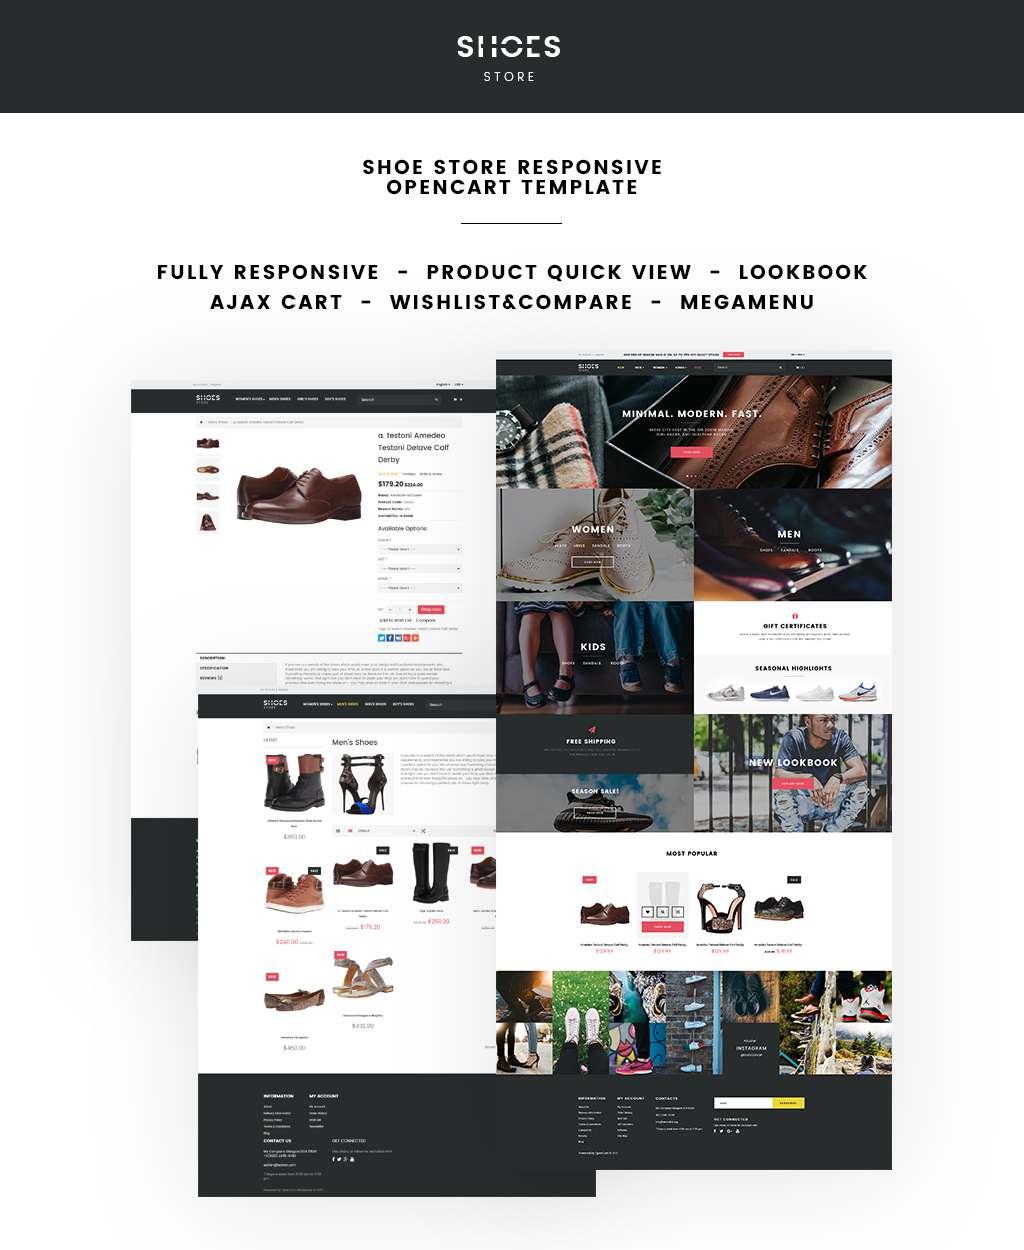 Shoe Store Responsive OpenCart Template TMT Kurt Glanville